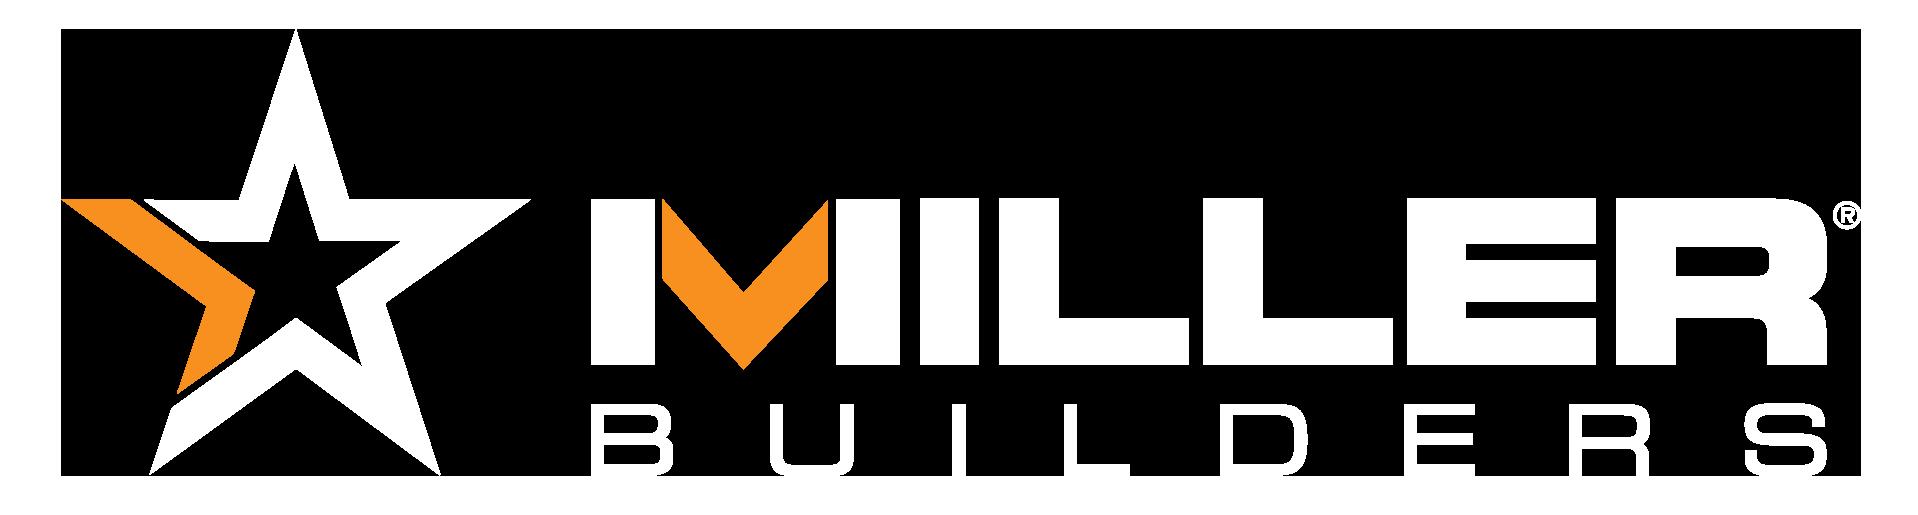 Miller Builders logo